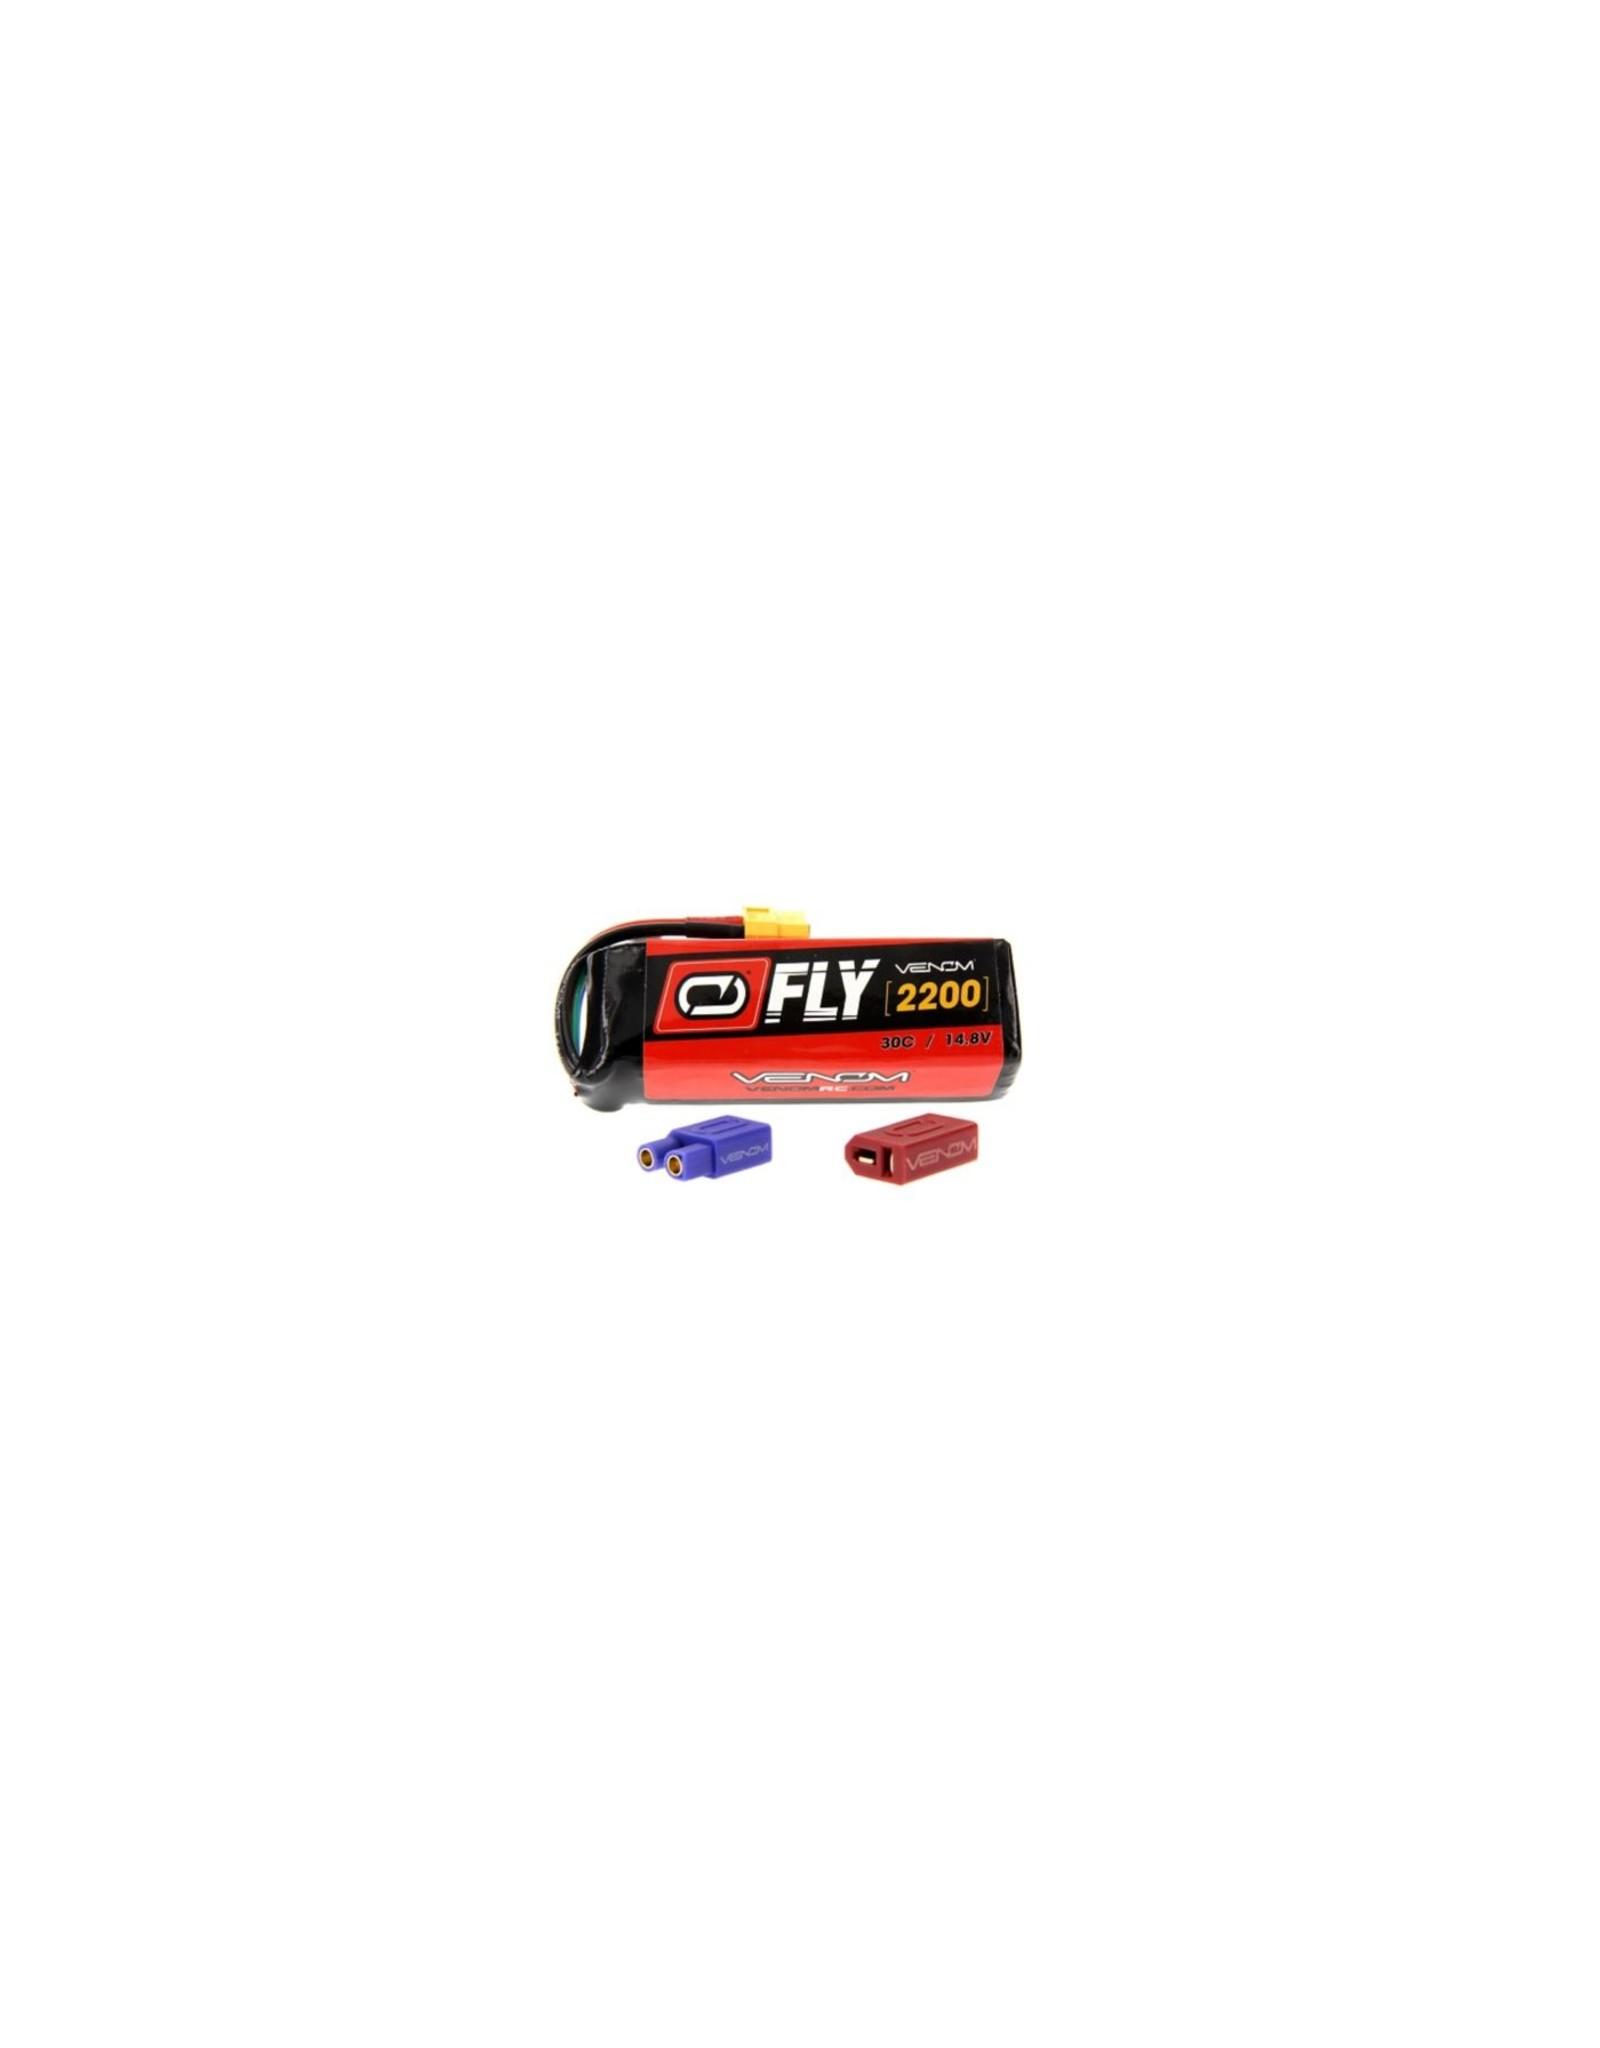 Venom Racing VNR25004 - 14.8V 2200mAh 4S 30C FLY LiPo Battery: UNI 2.0 Plug